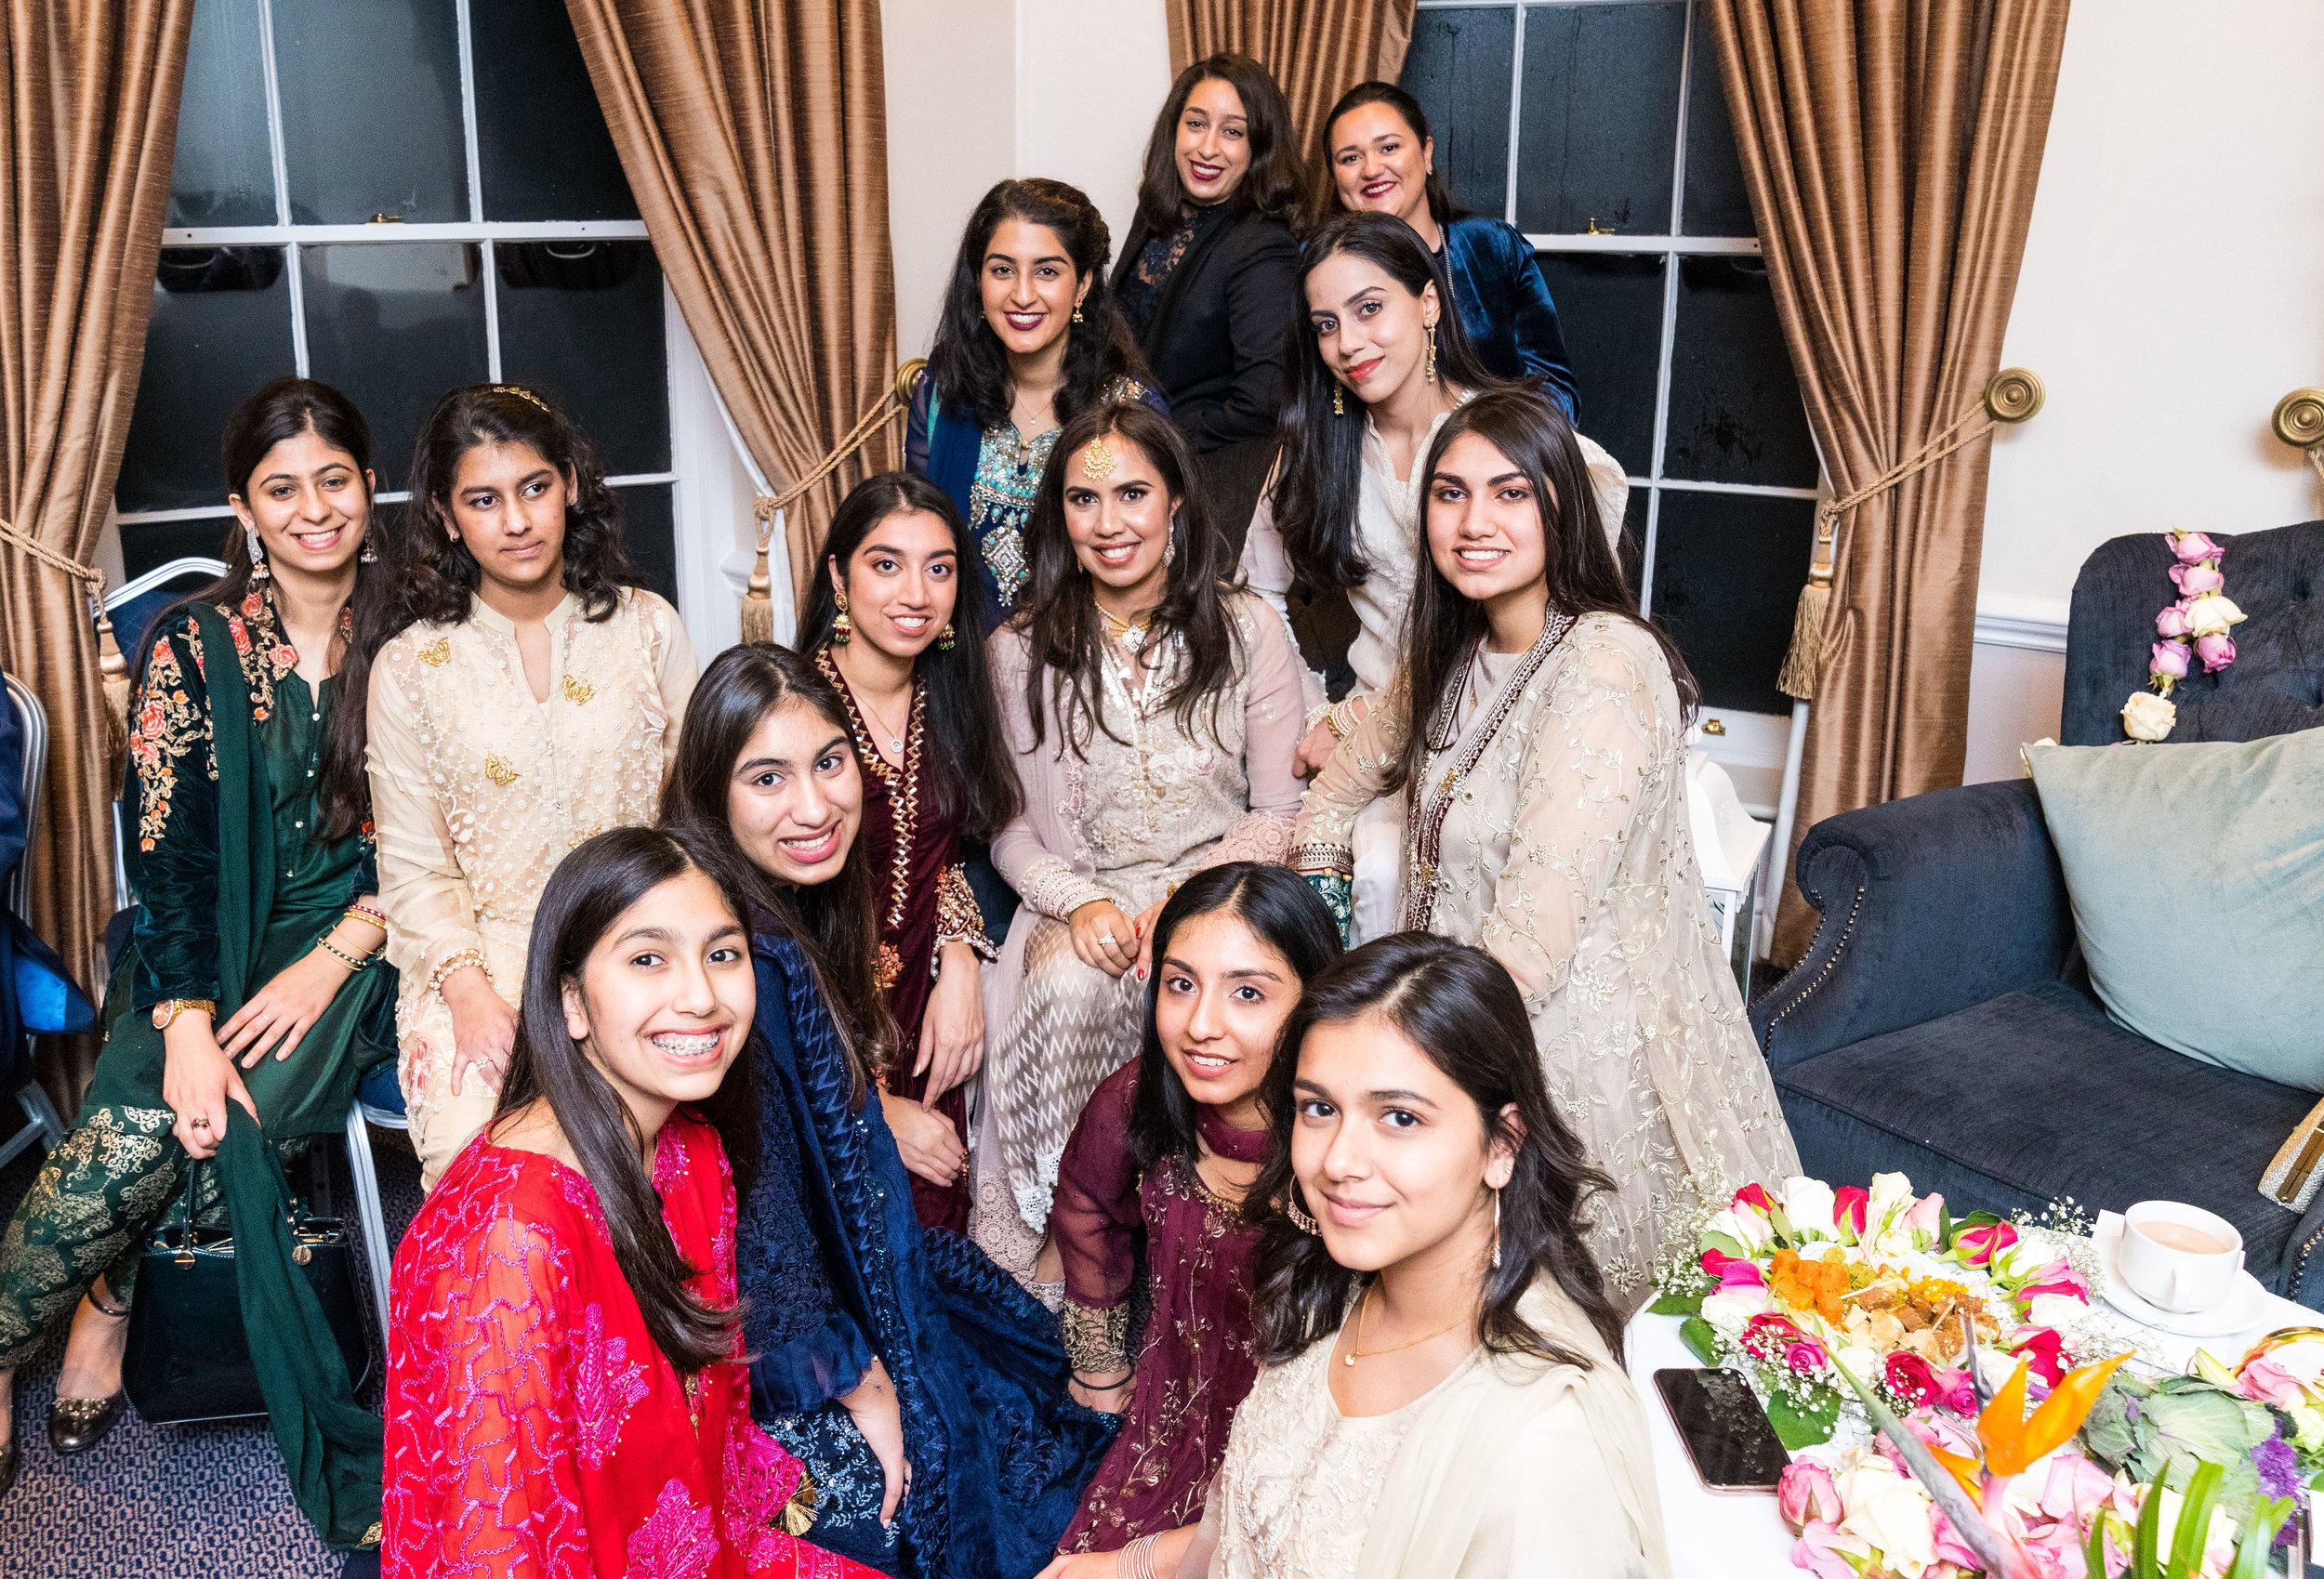 buckinghamshire-golf-club-winter-muslim-wedding-engagement-photography-videography-63